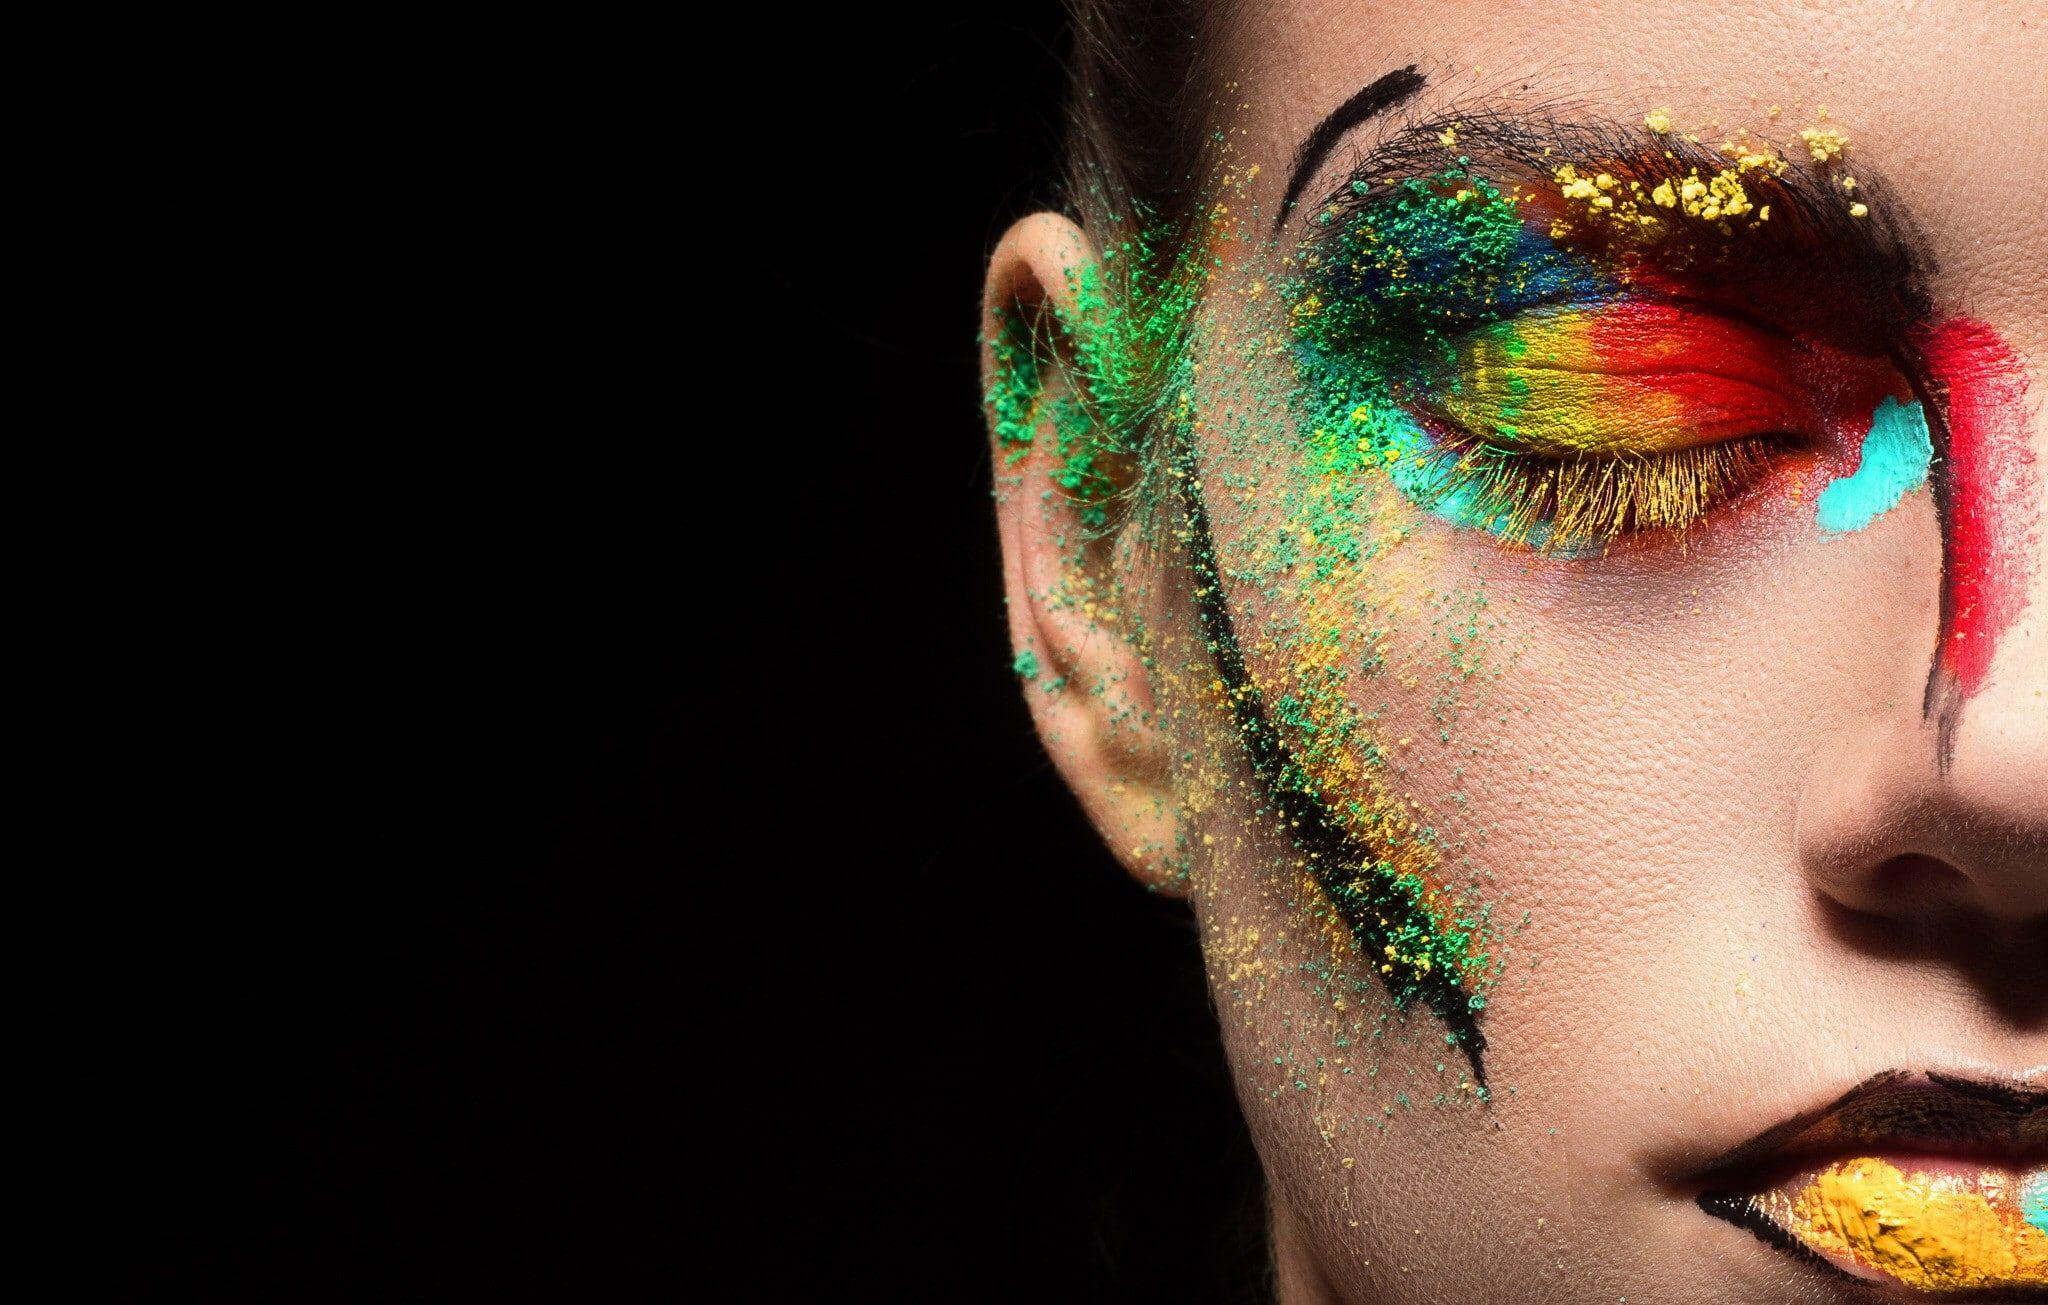 makeup closed eyes face women model eyeshadow